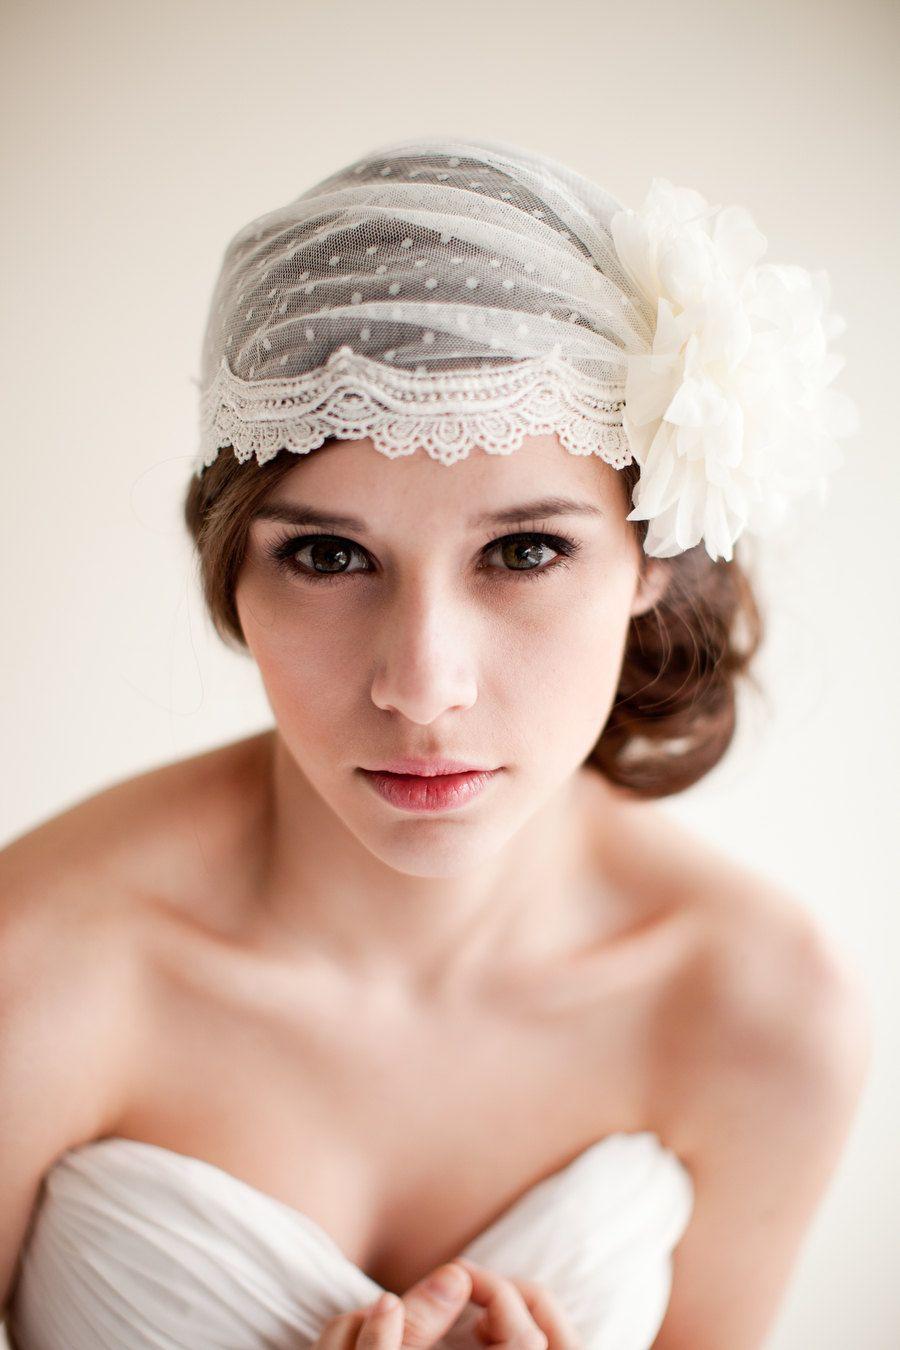 Dotted bridal cap juliet cap bridal veil by melindarosedesign